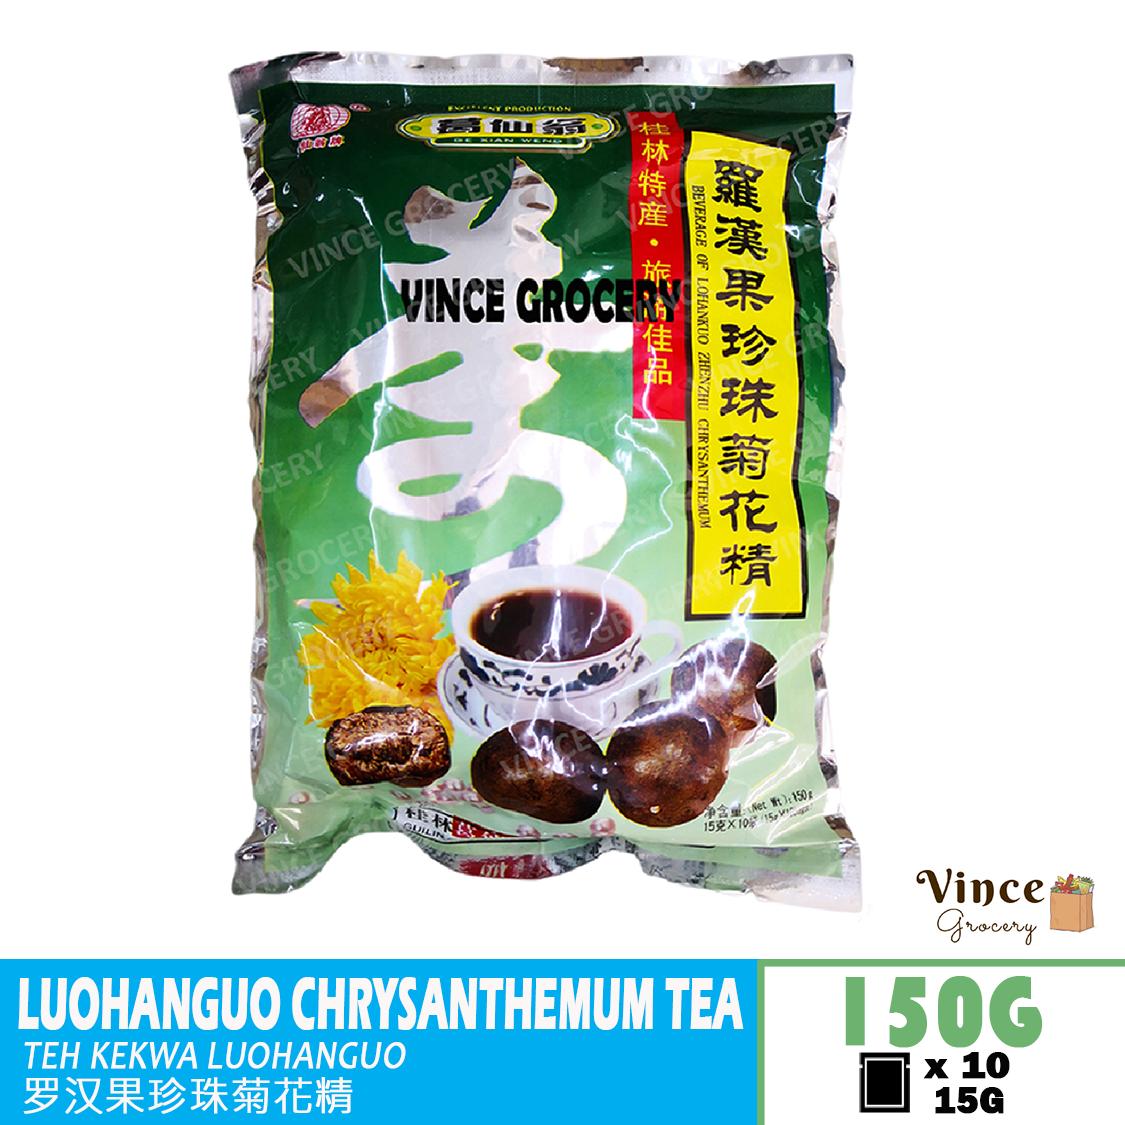 GE XIAN WENG Lohankuo Zhenzhu Chrysanthemum Beverage Tea  葛仙翁罗汉果珍珠菊花精 150G (10's x 15G)